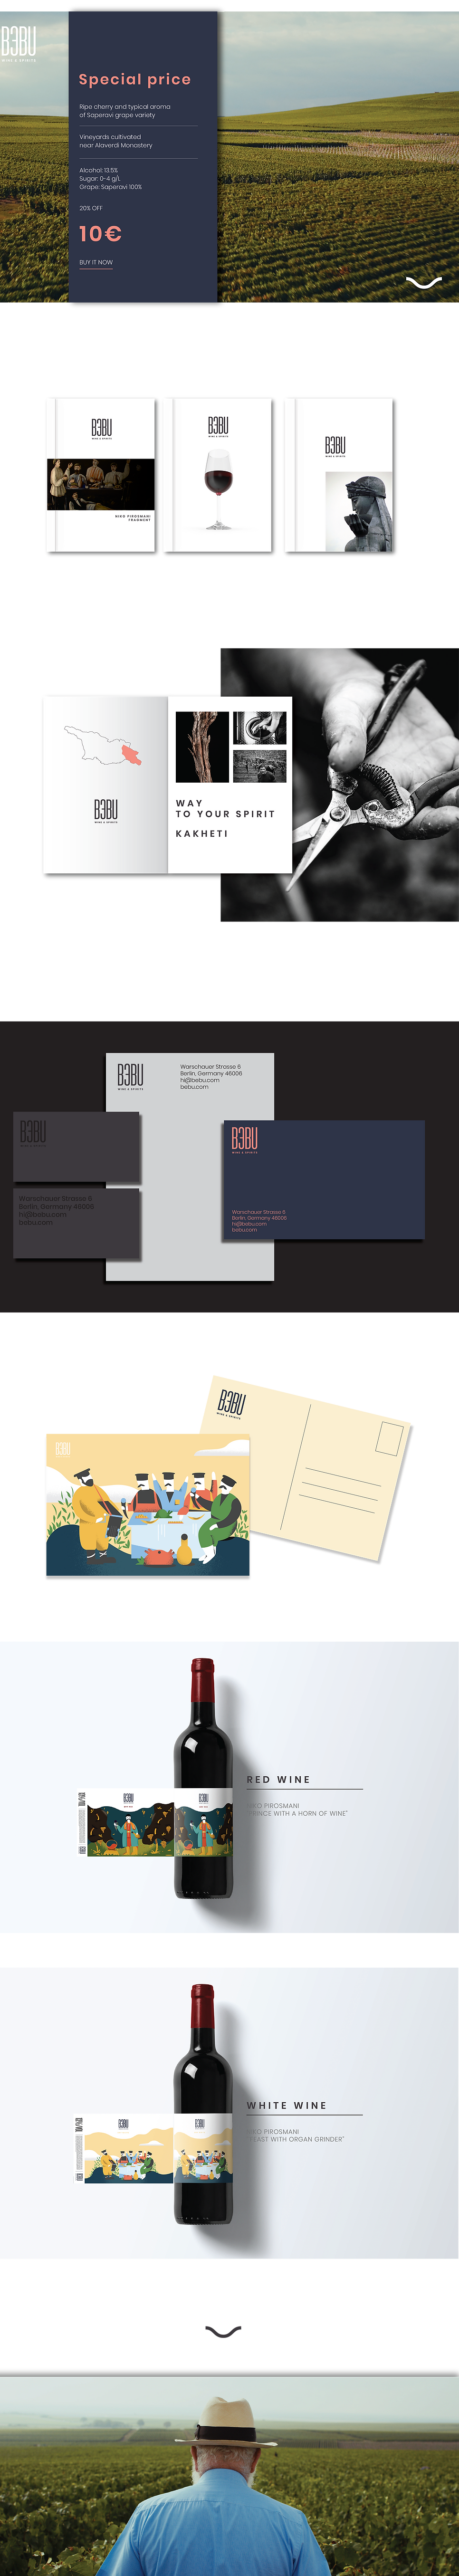 Bebu group brand visual indetity guidlines